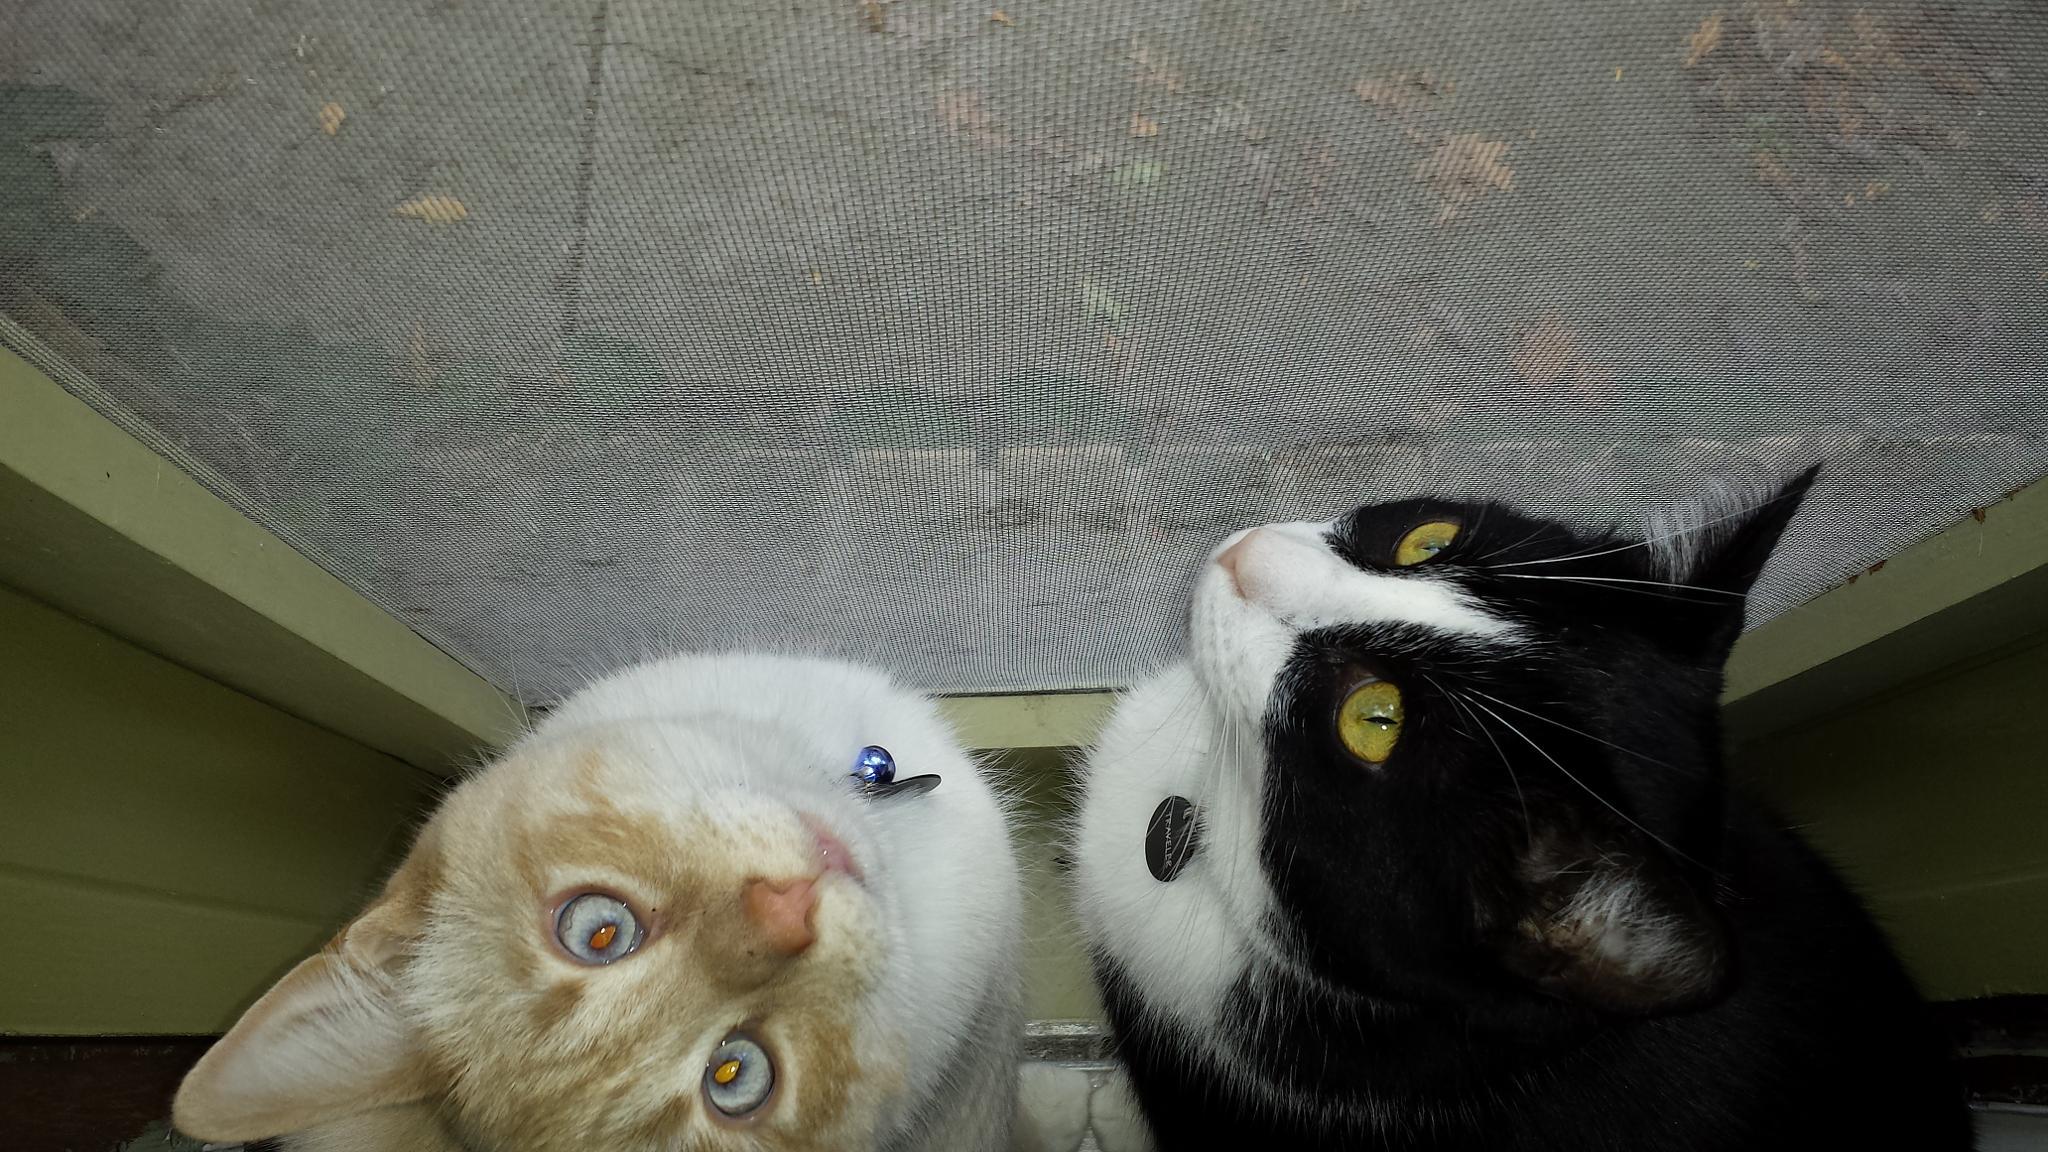 Curious cats by mimi.difrancesca